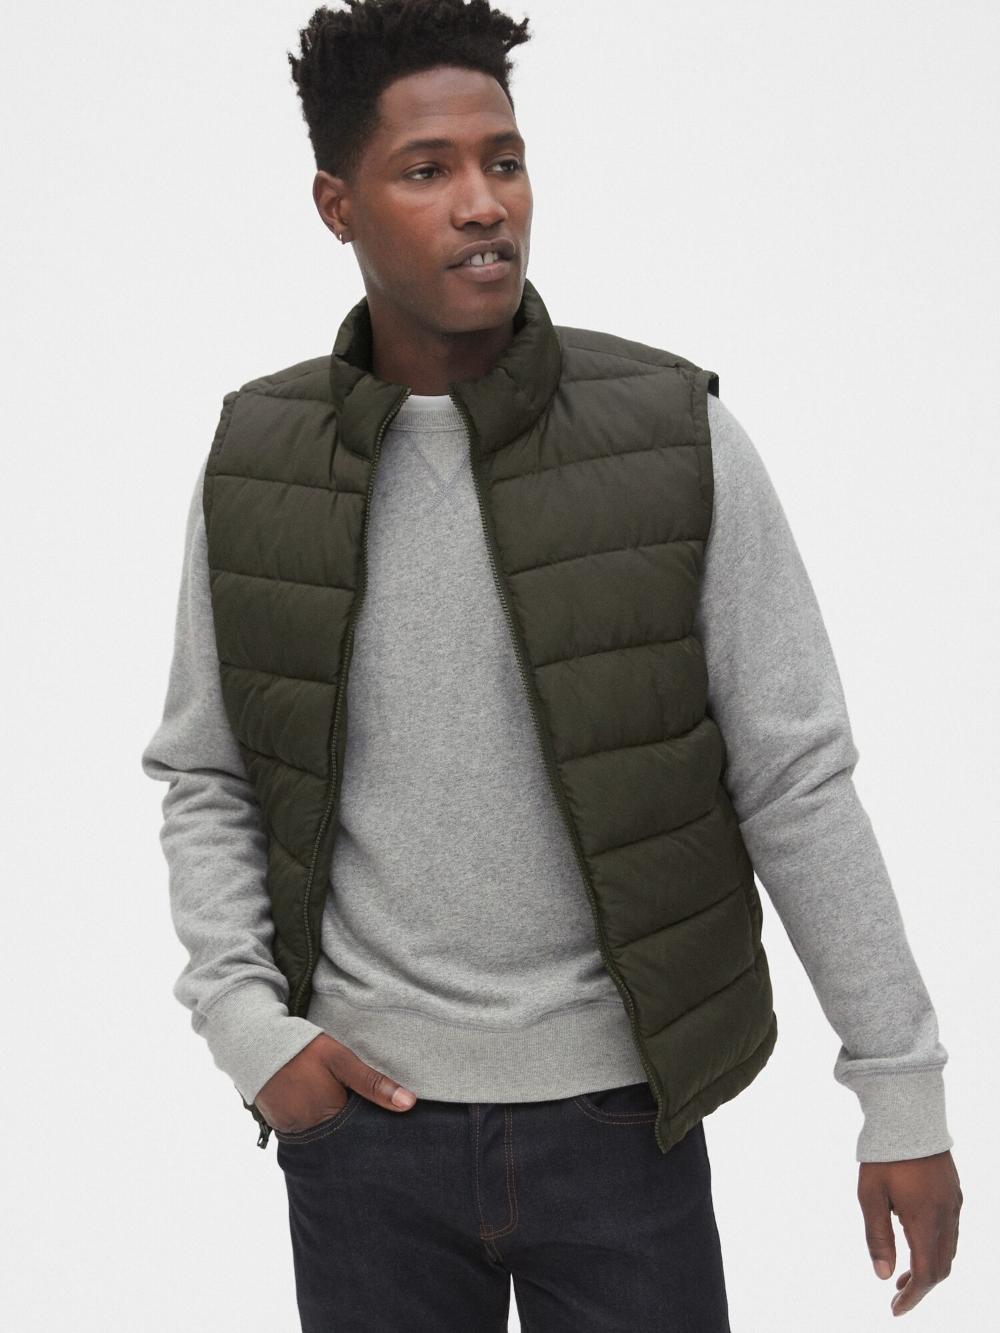 Shop Women Men Maternity Baby Kids Clothes Gap Gap Uk Mens Outfits Puffer Vest Microfleece [ 1333 x 1000 Pixel ]